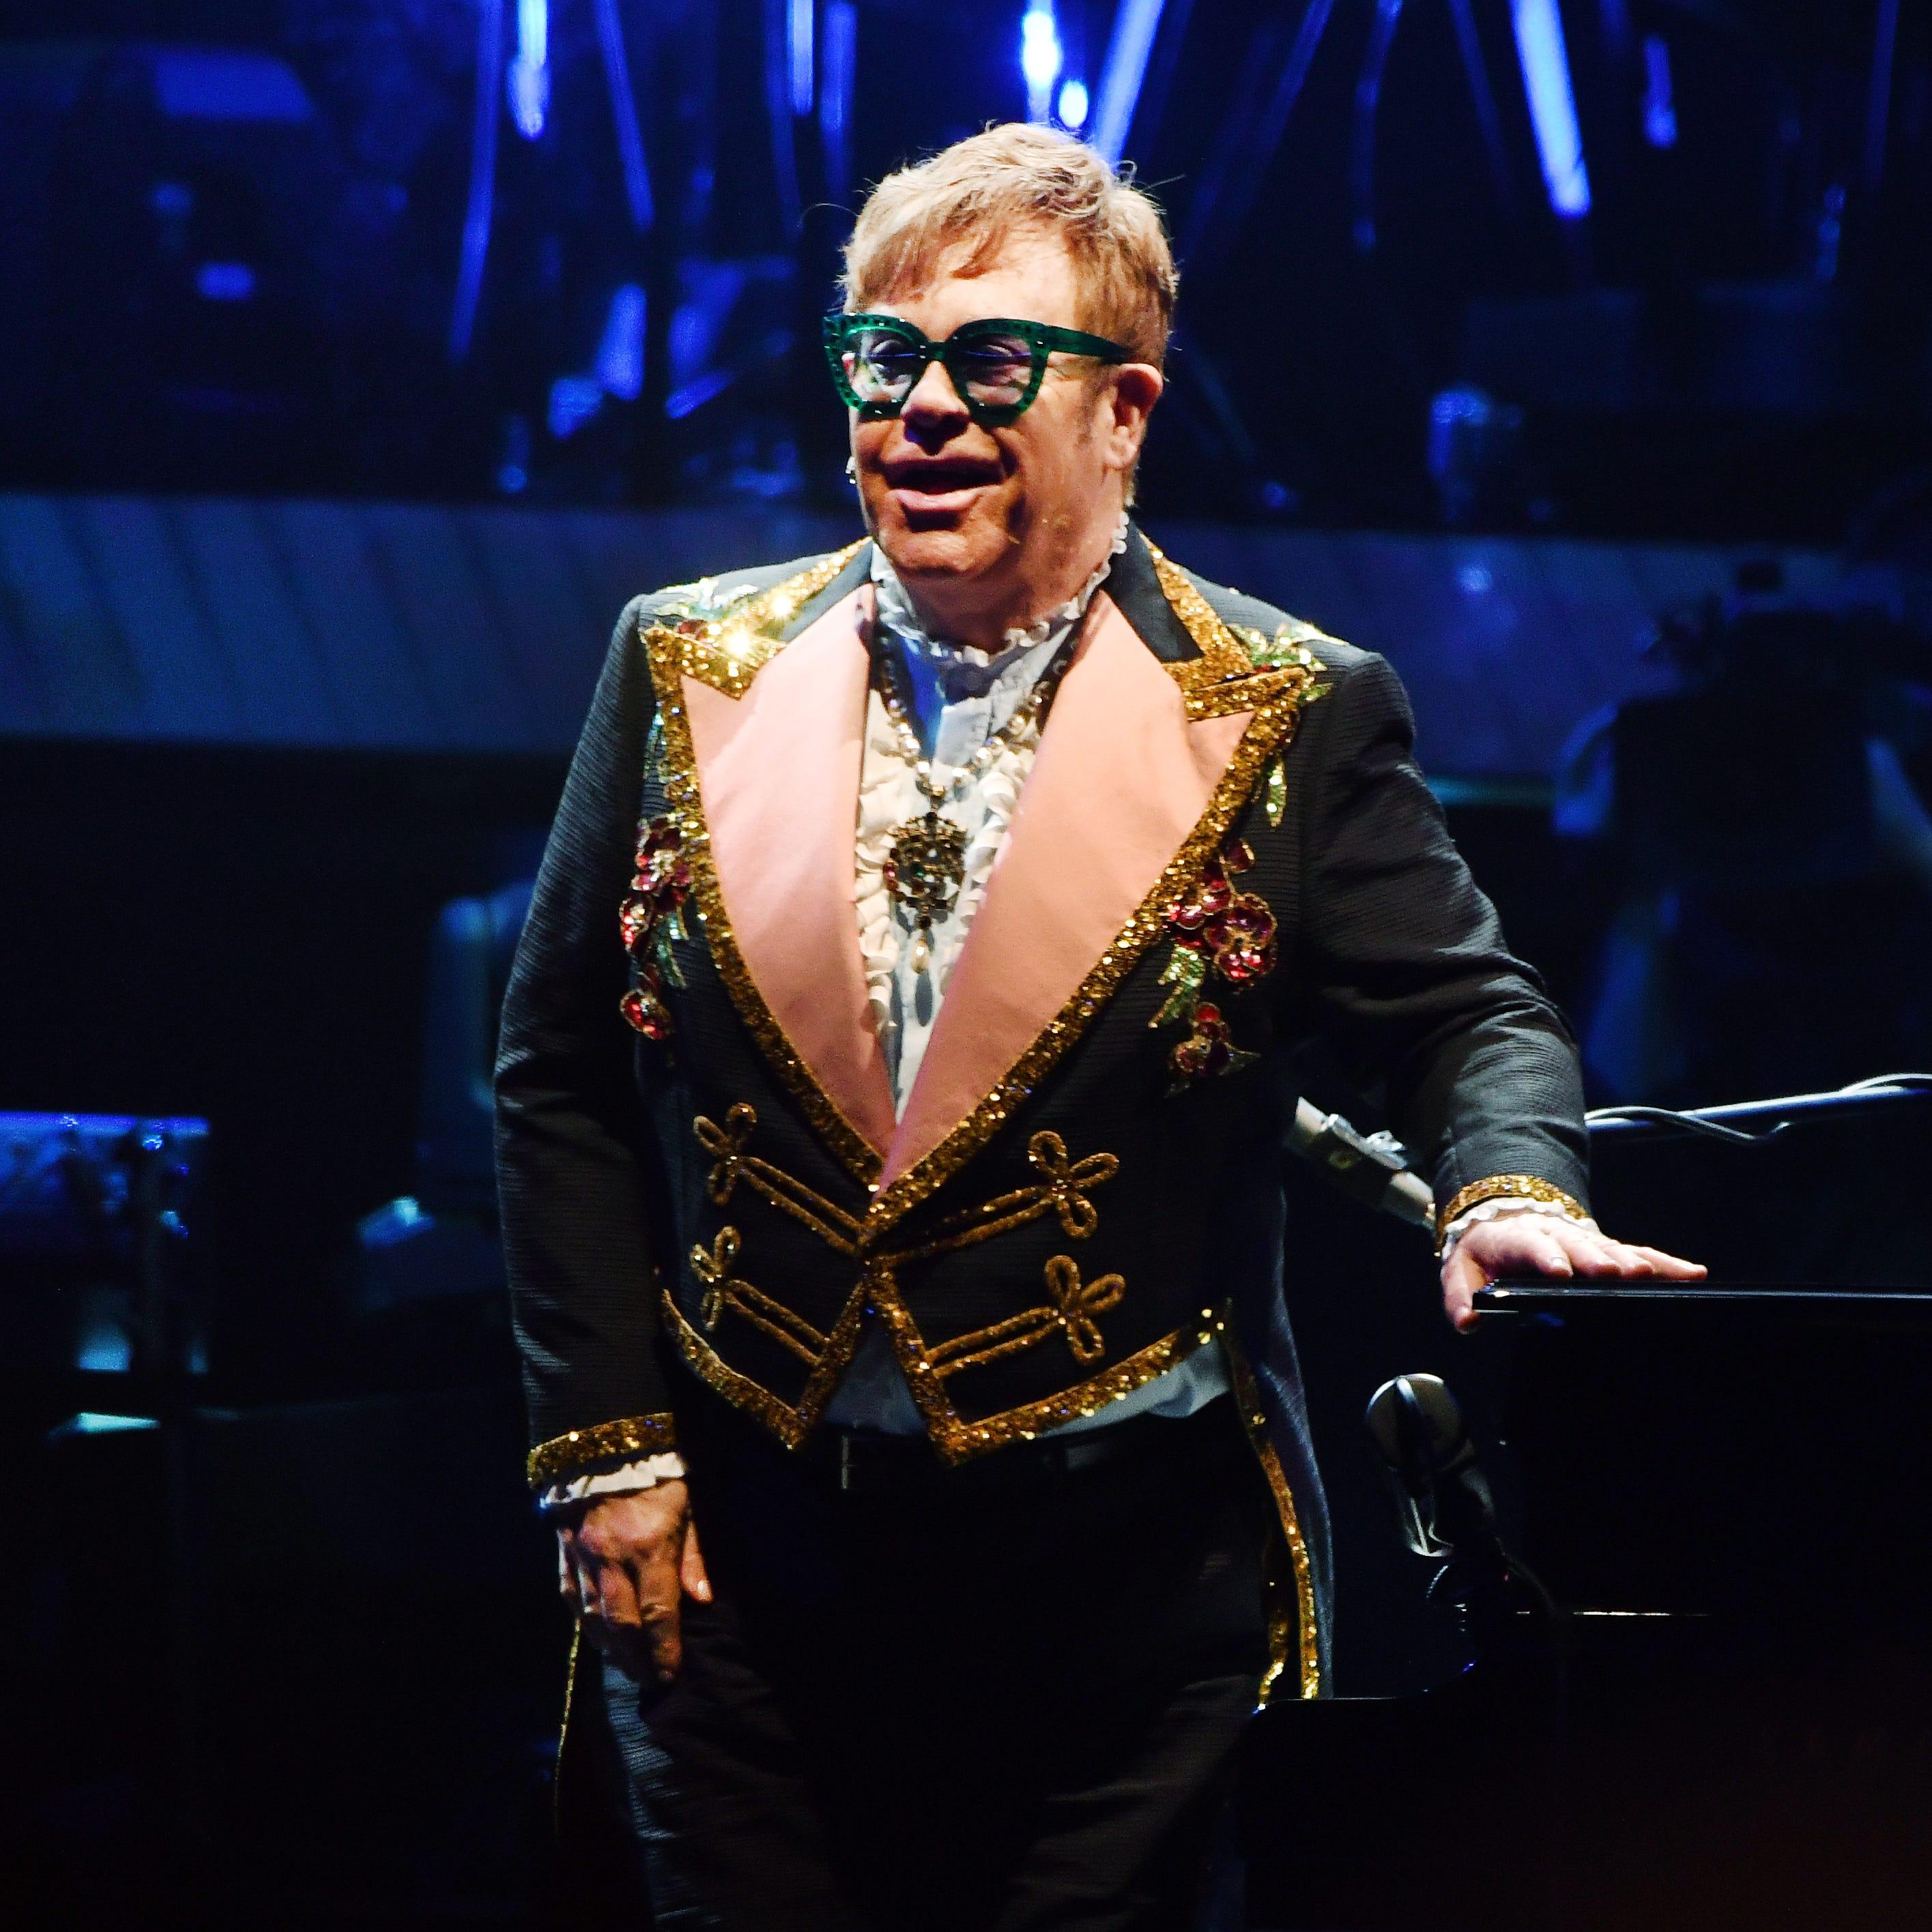 Review: Elton John bids a fond farewell at Little Caesars Arena